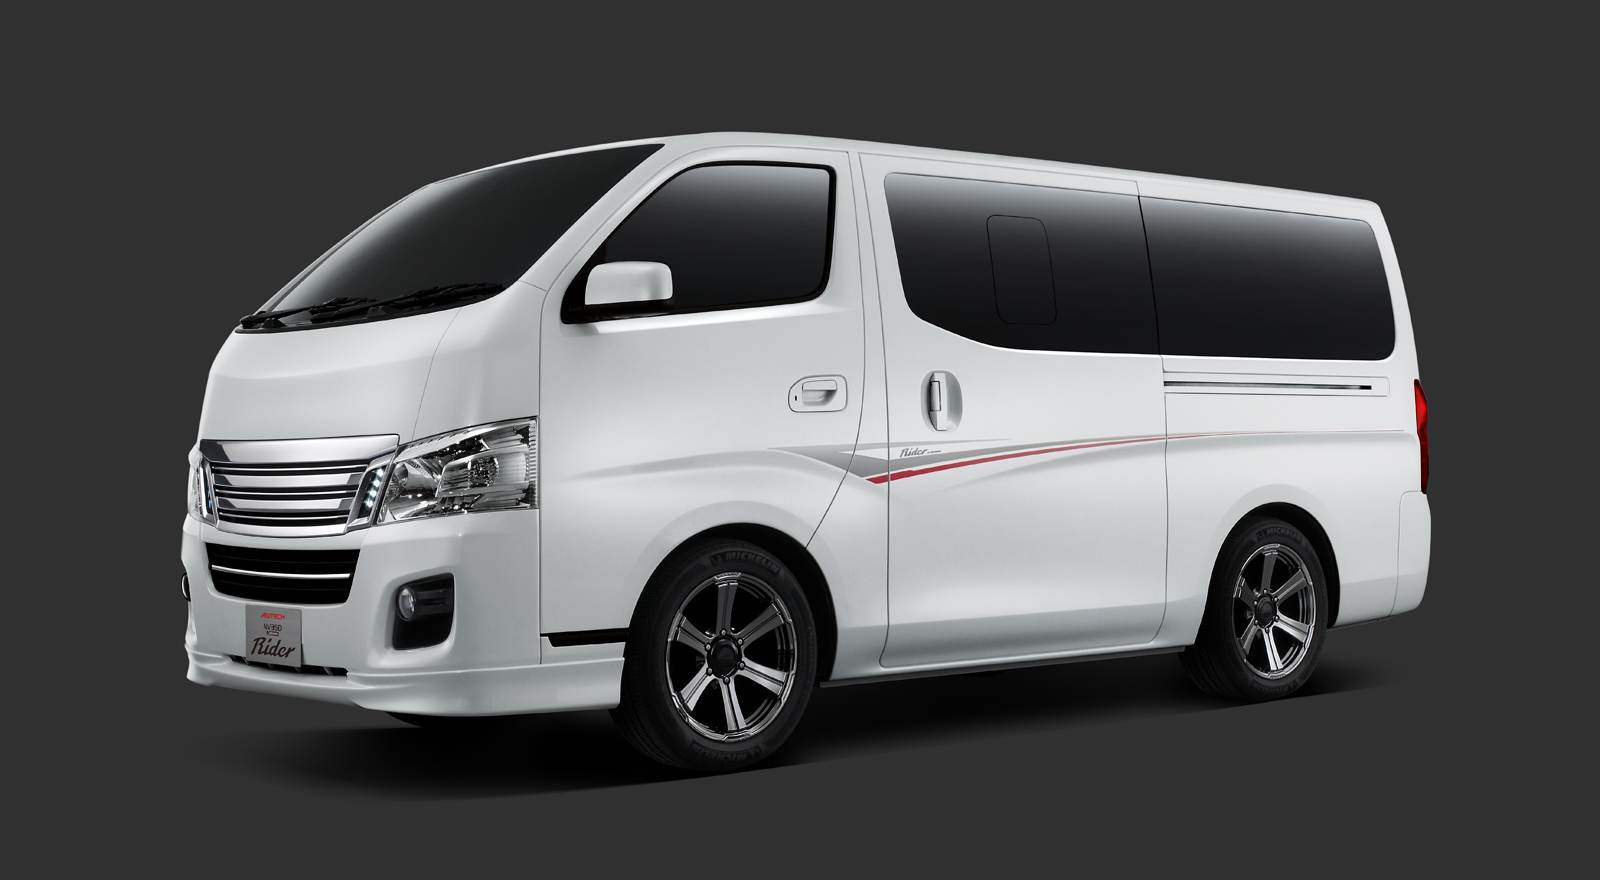 2016 Nissan Nv350 Caravan Newhairstylesformen2014 Com